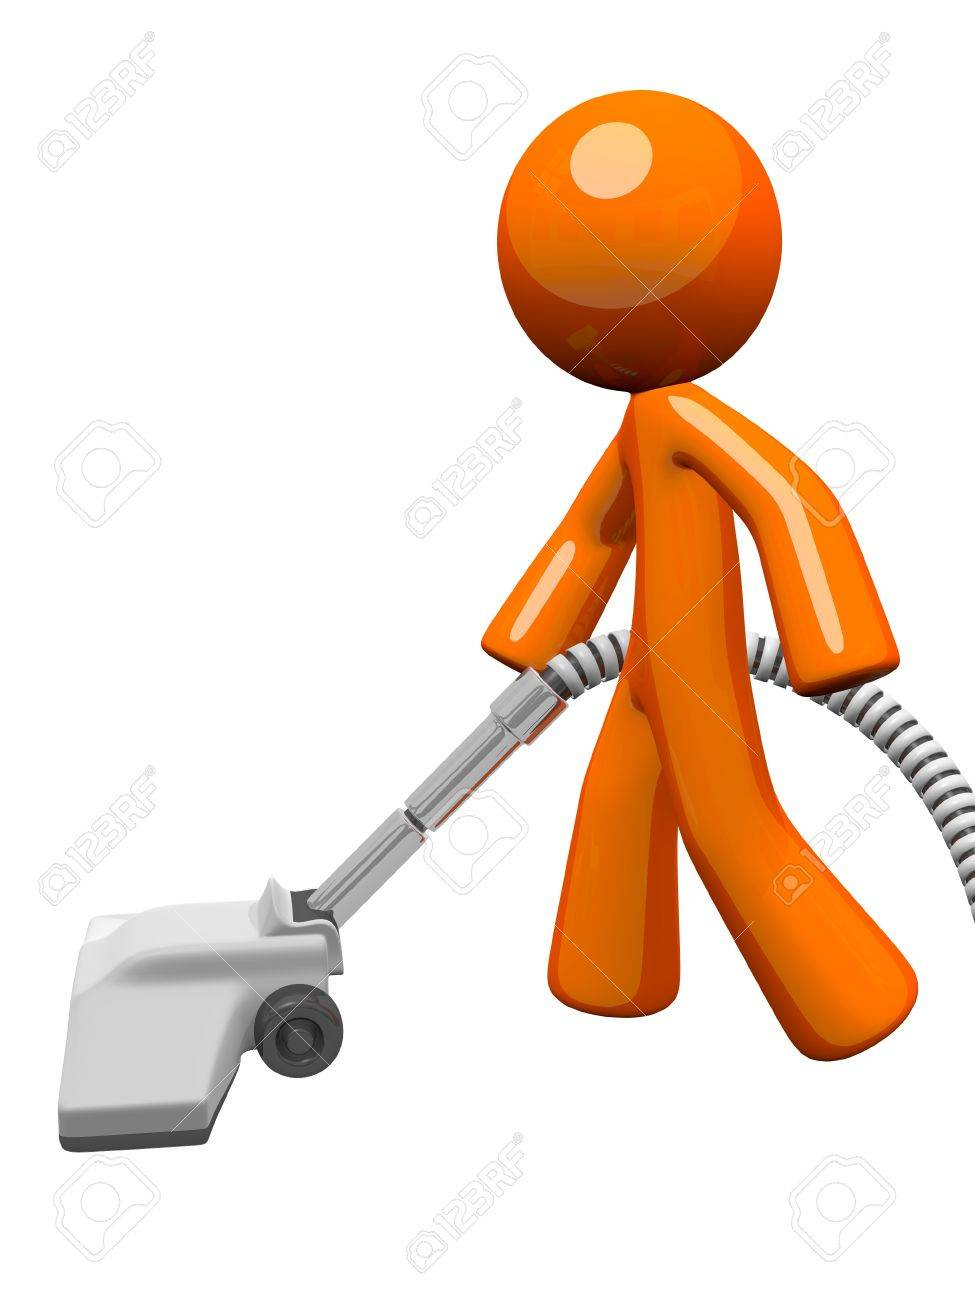 Orange man vacuuming and cleaning house. Stock Photo - 12803659